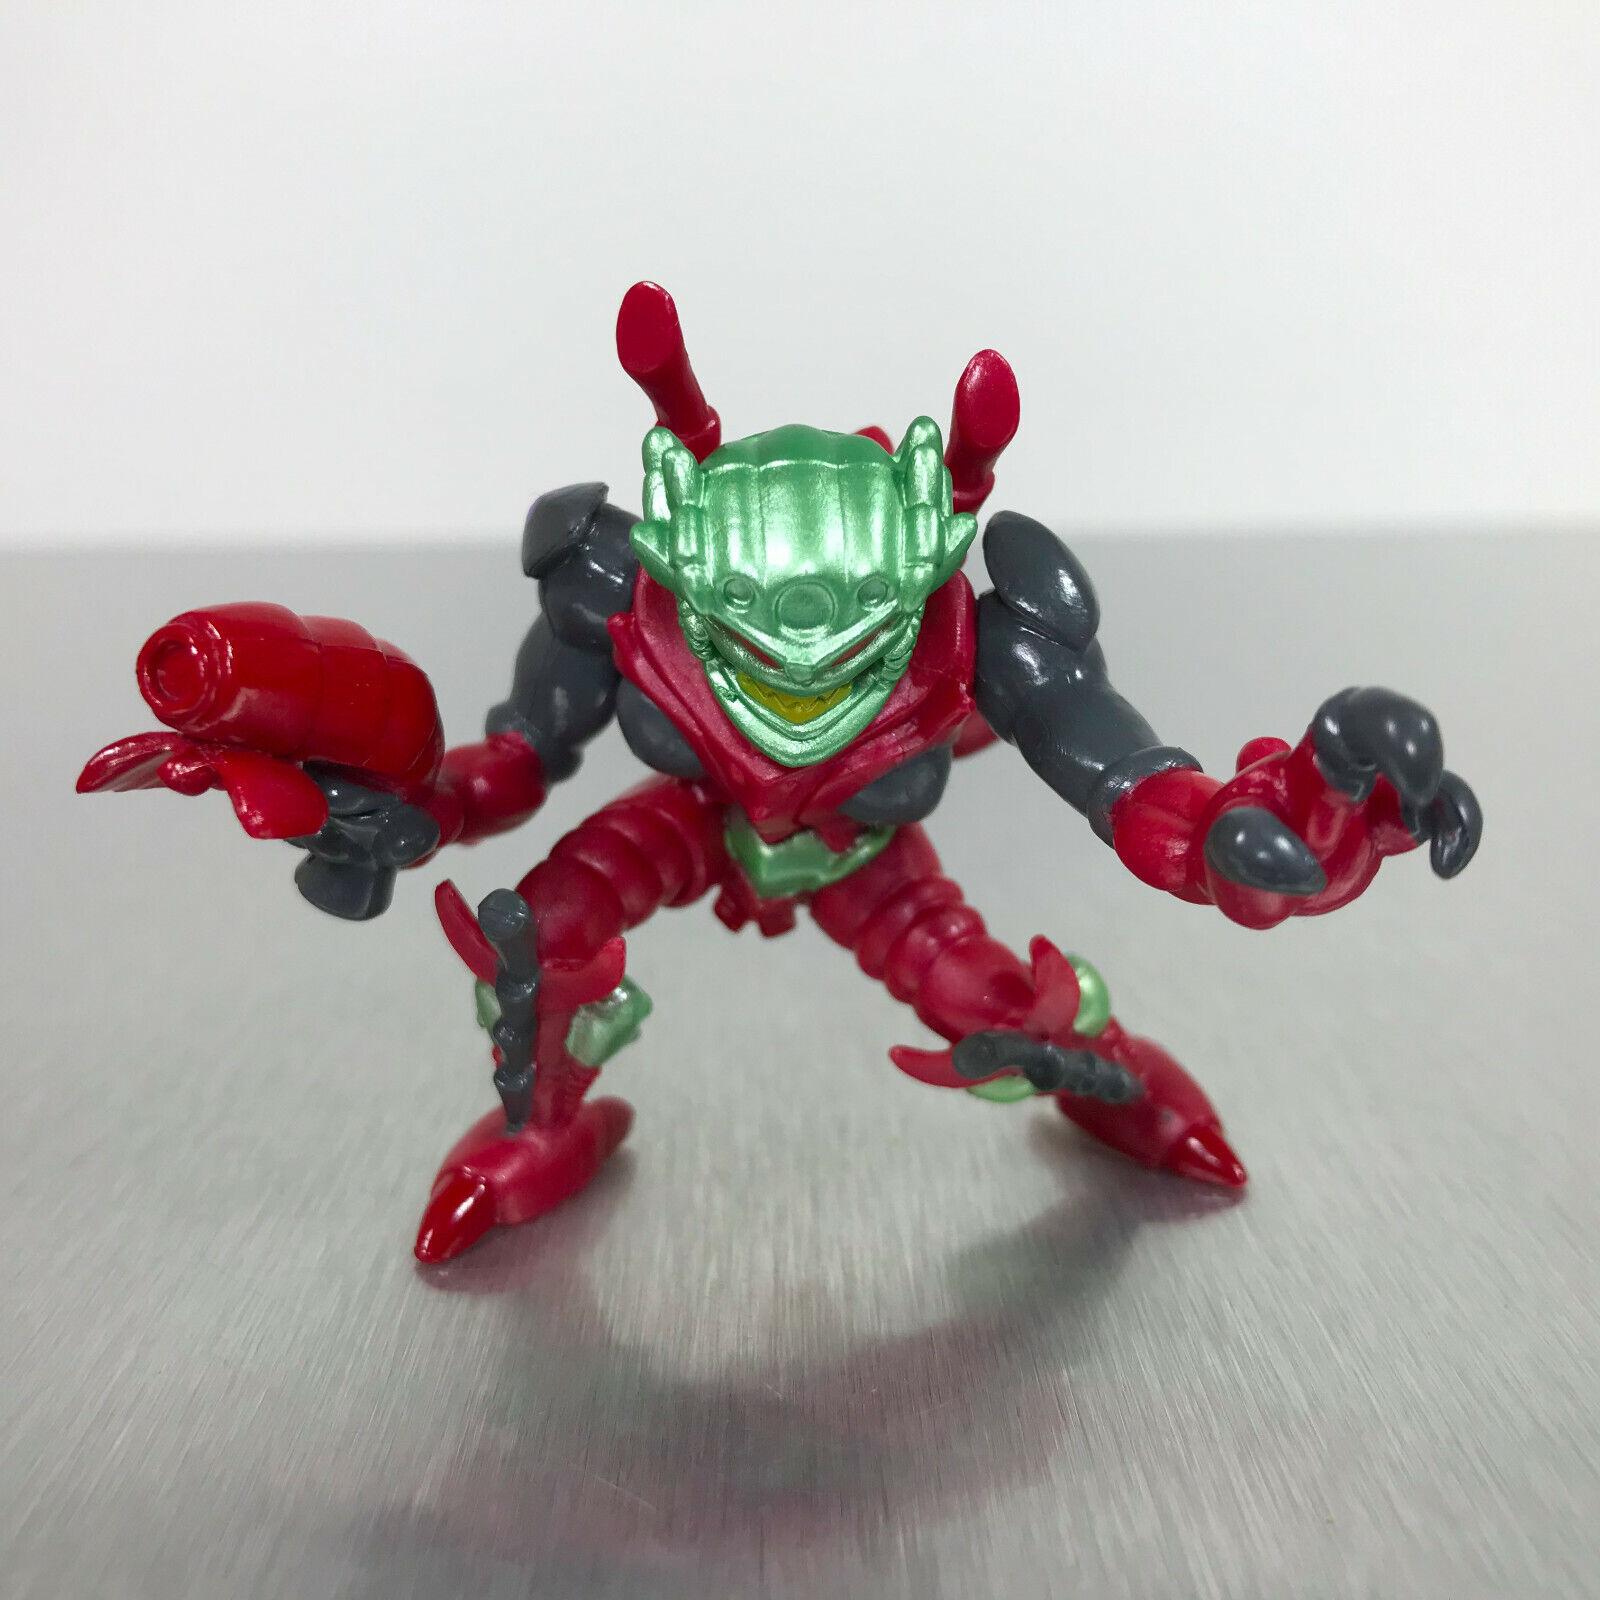 Transformers Robot Heroes INFERNO cifra Unreleased Wave 5 Beast guerras